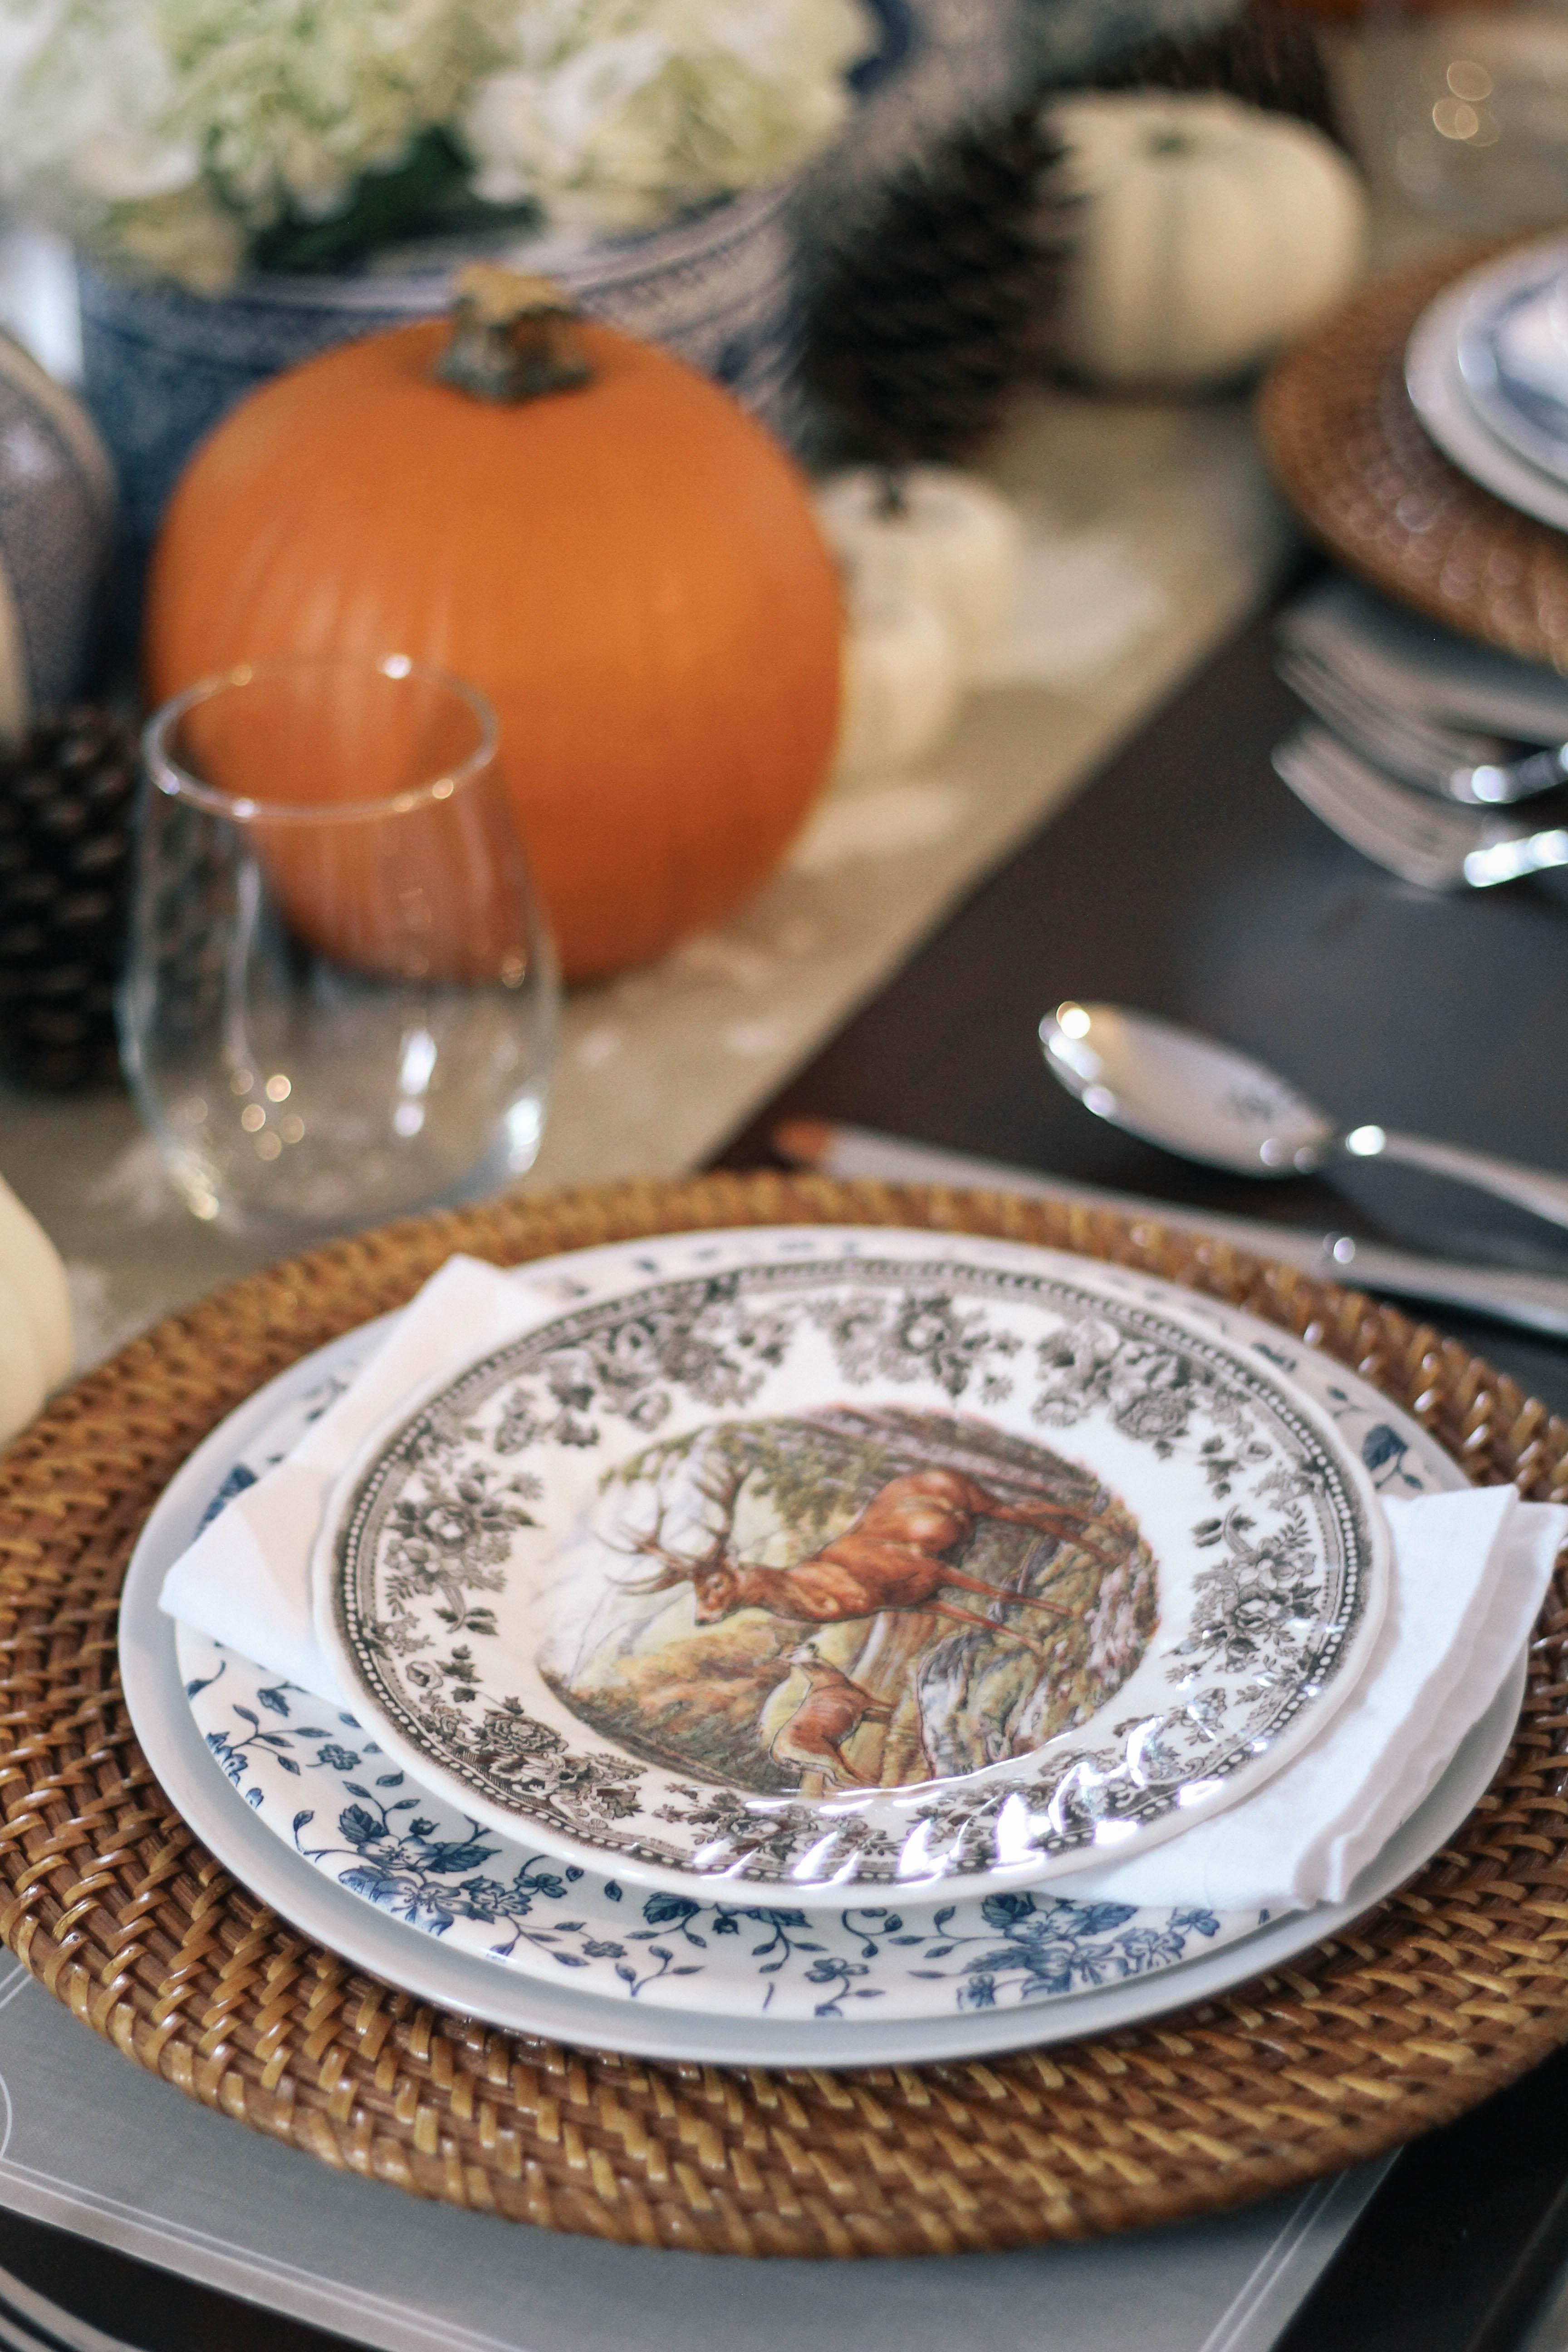 Thanksgiving-Tablescape-Ginger-Jars-Pumpkins-Blue-White-Orange-Animal-Game-Plate-China-2